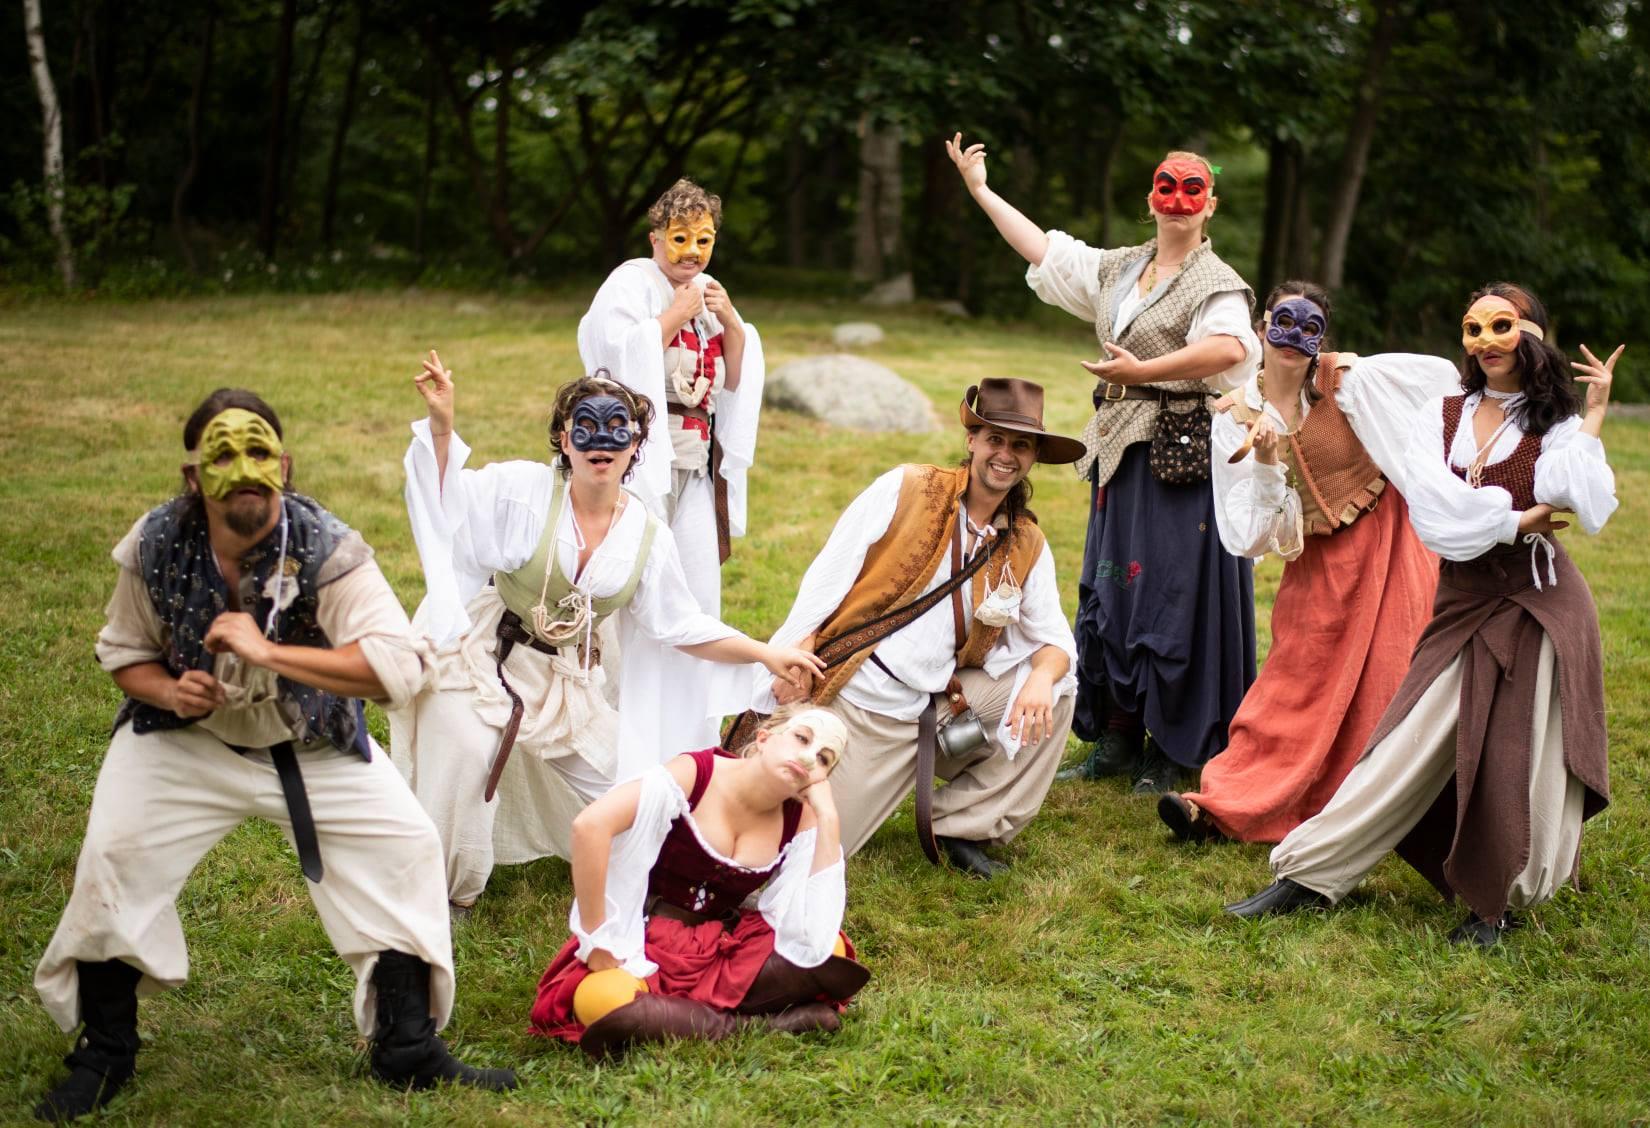 Entertainment: Commedia della arte improv performers sketch comedy